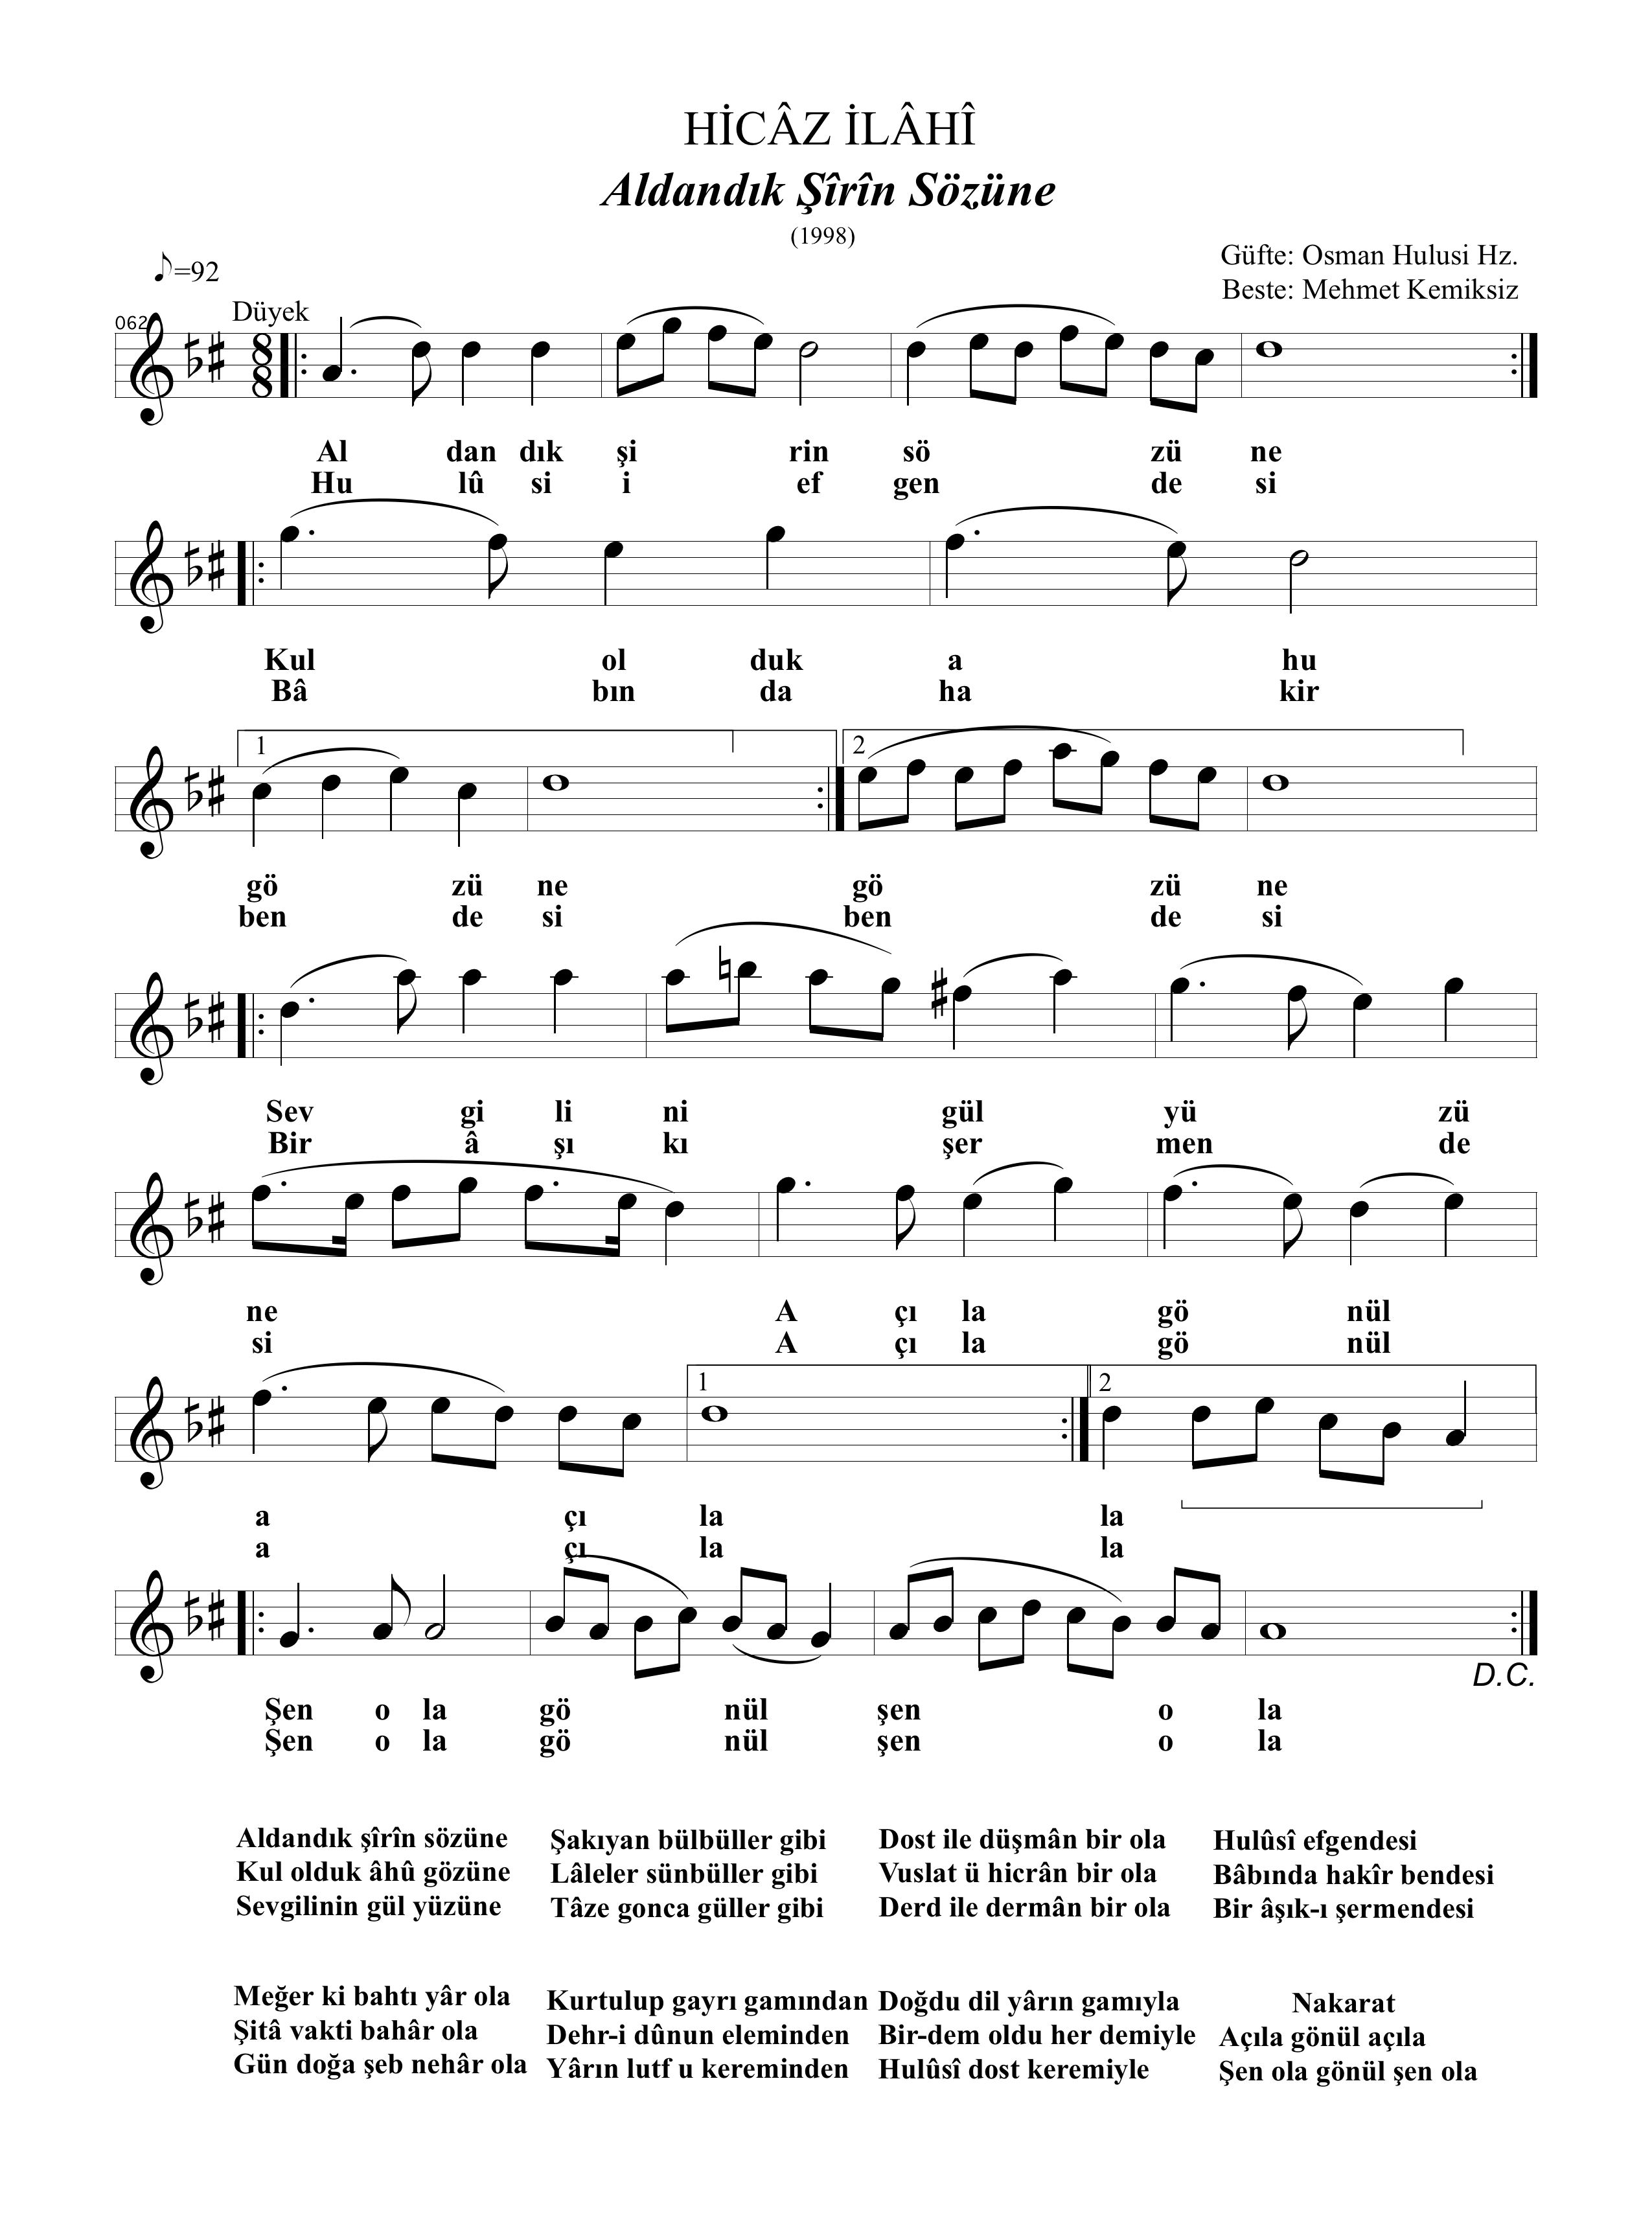 062-Hicaz-Aldandik Sirin Sozune